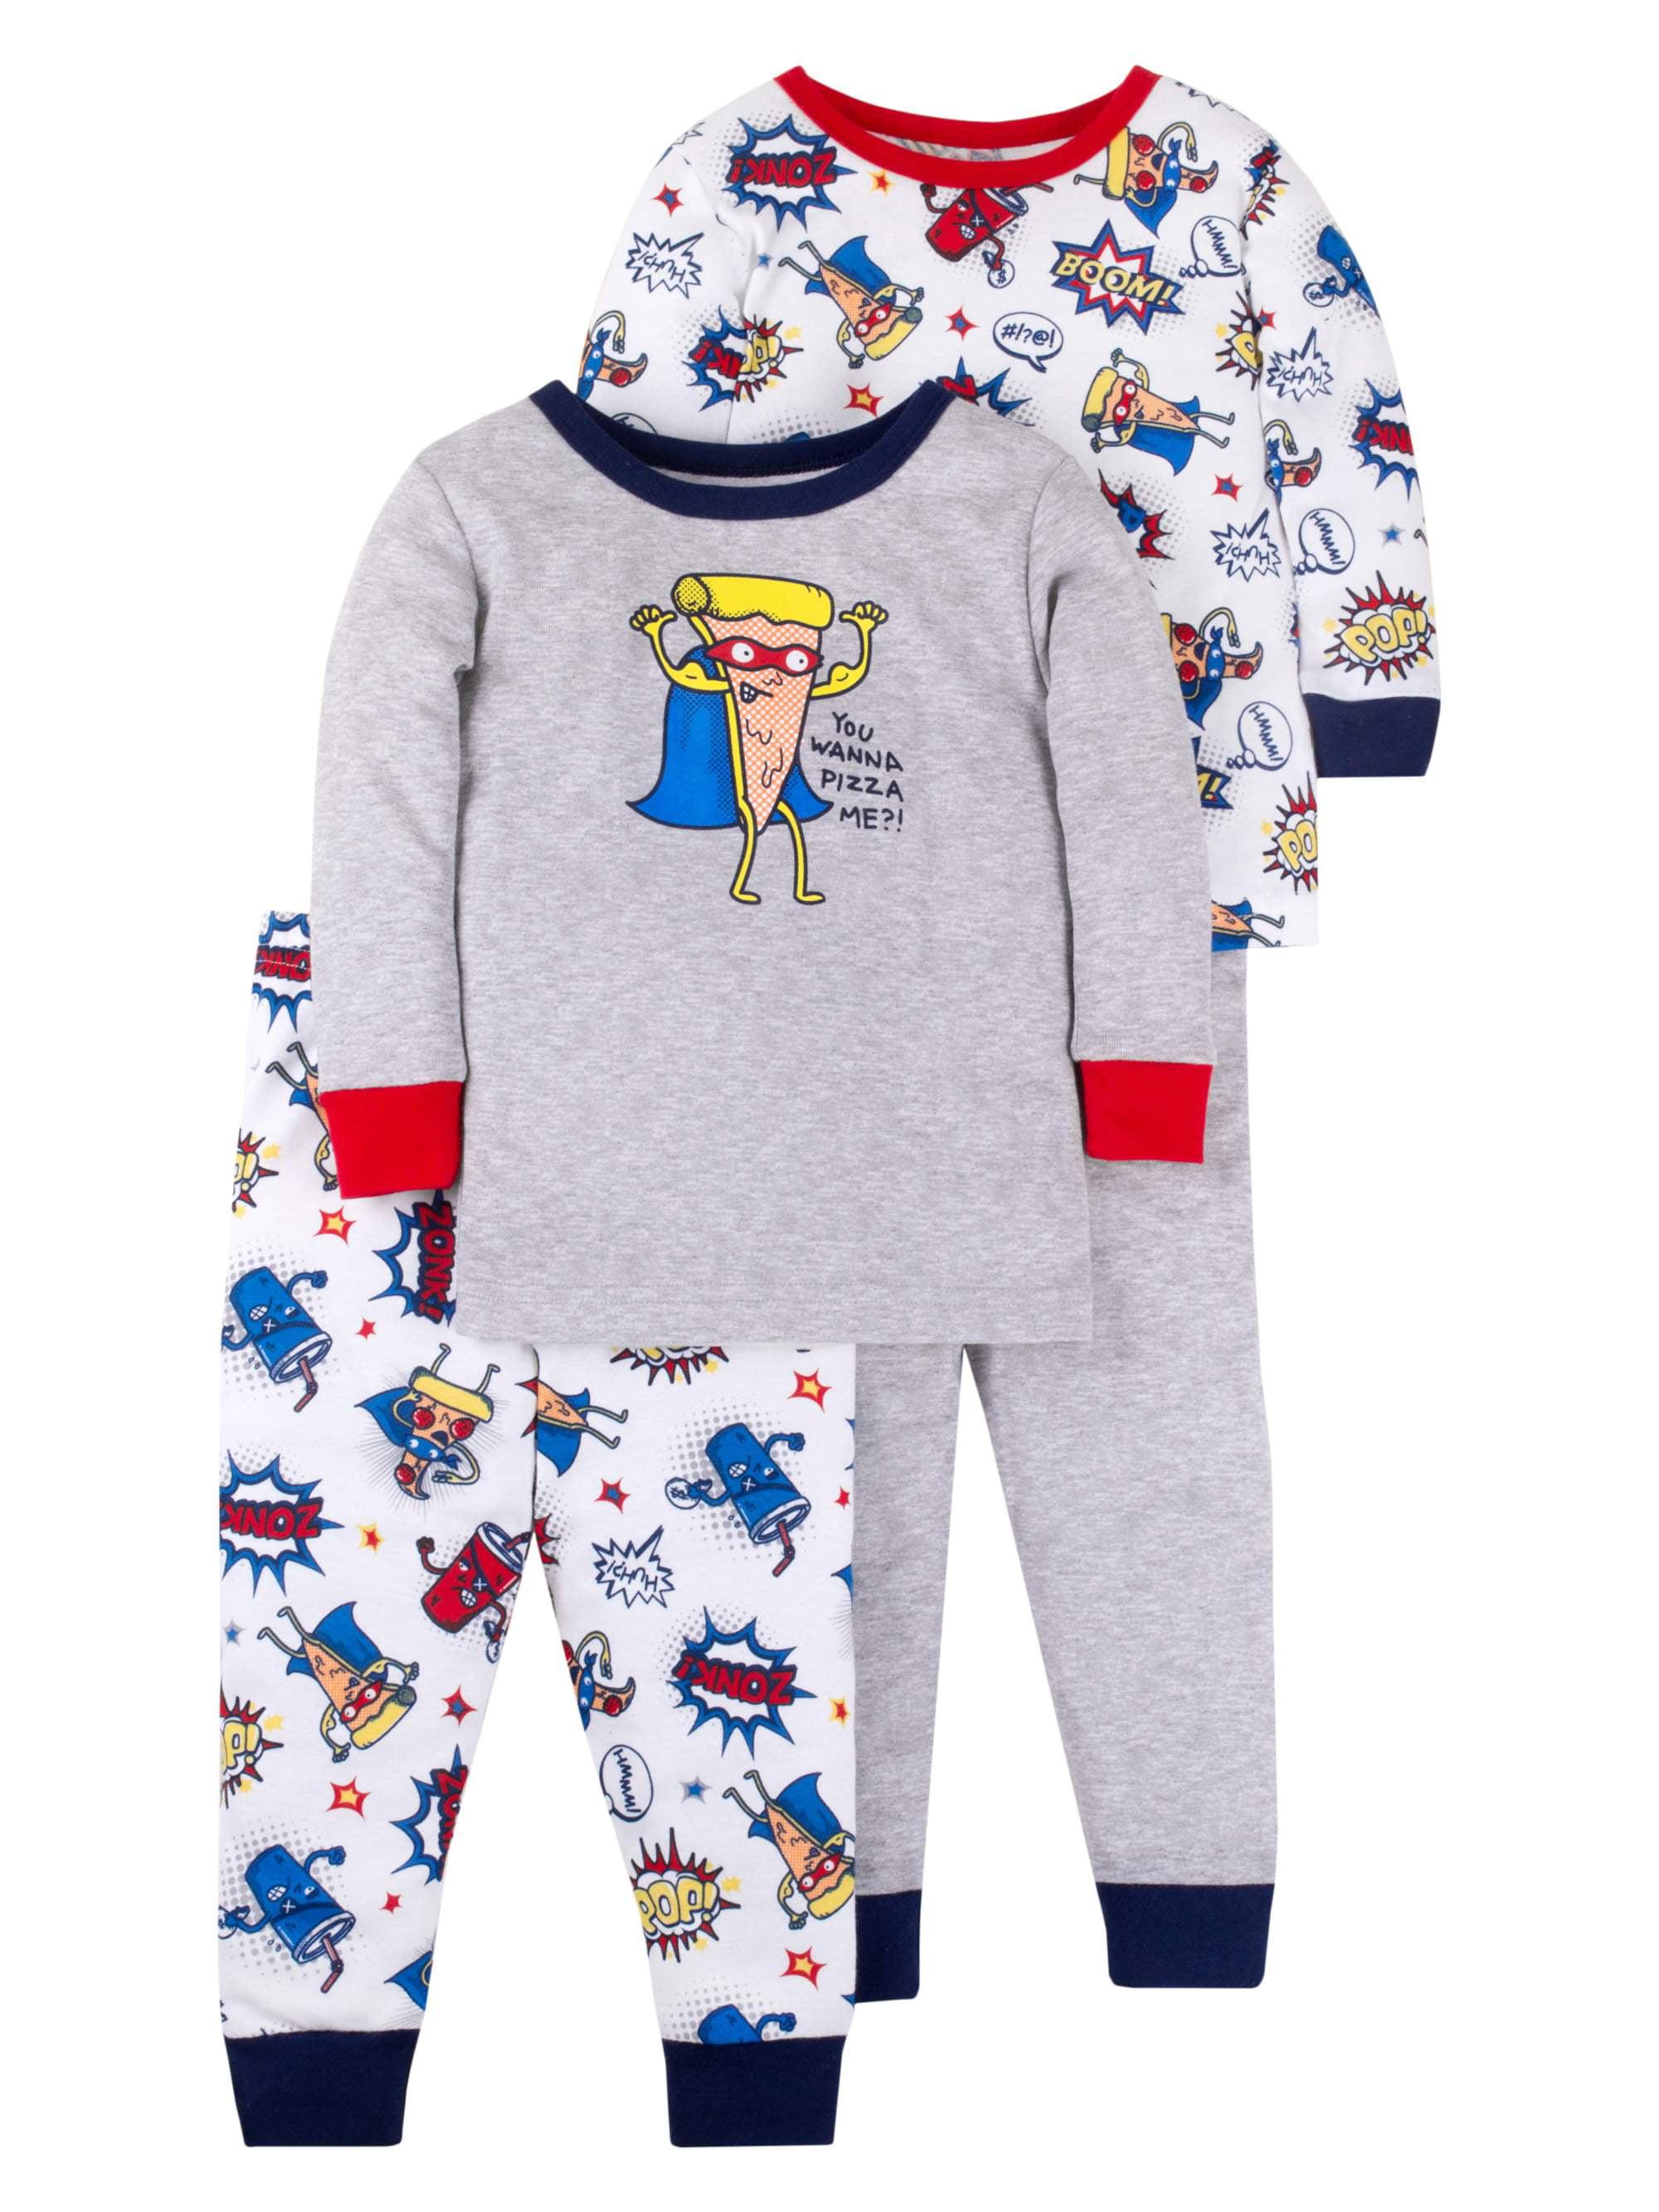 Cotton Tight Fit Pajamas, 4-piece Set (Baby Boys & Toddler Boys)